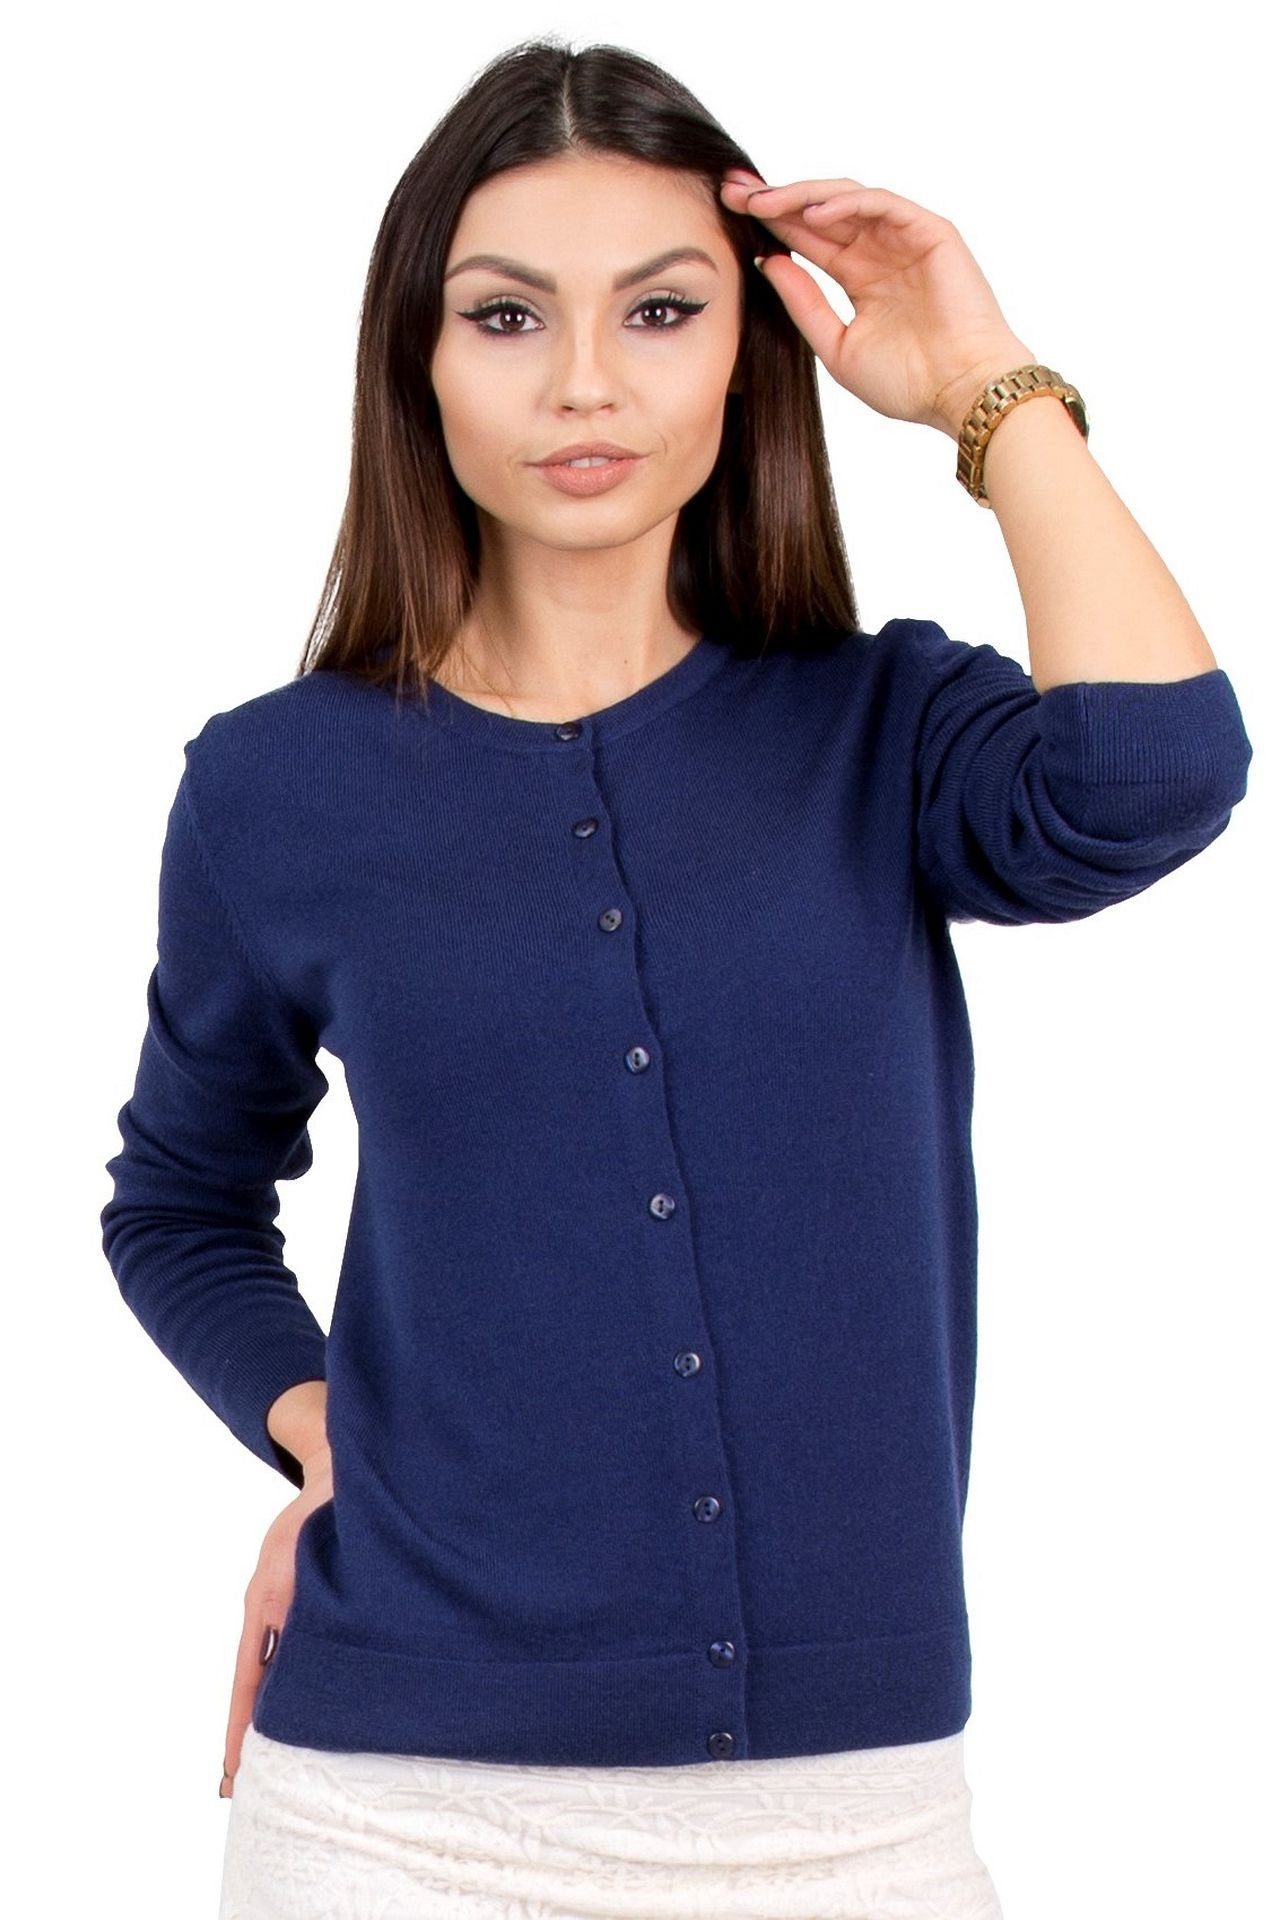 KNITTONS Women's 100% Merino Wool Button up Crewneck Cardigan Sweater Long Sleeve (X-Large, Navy Blue)